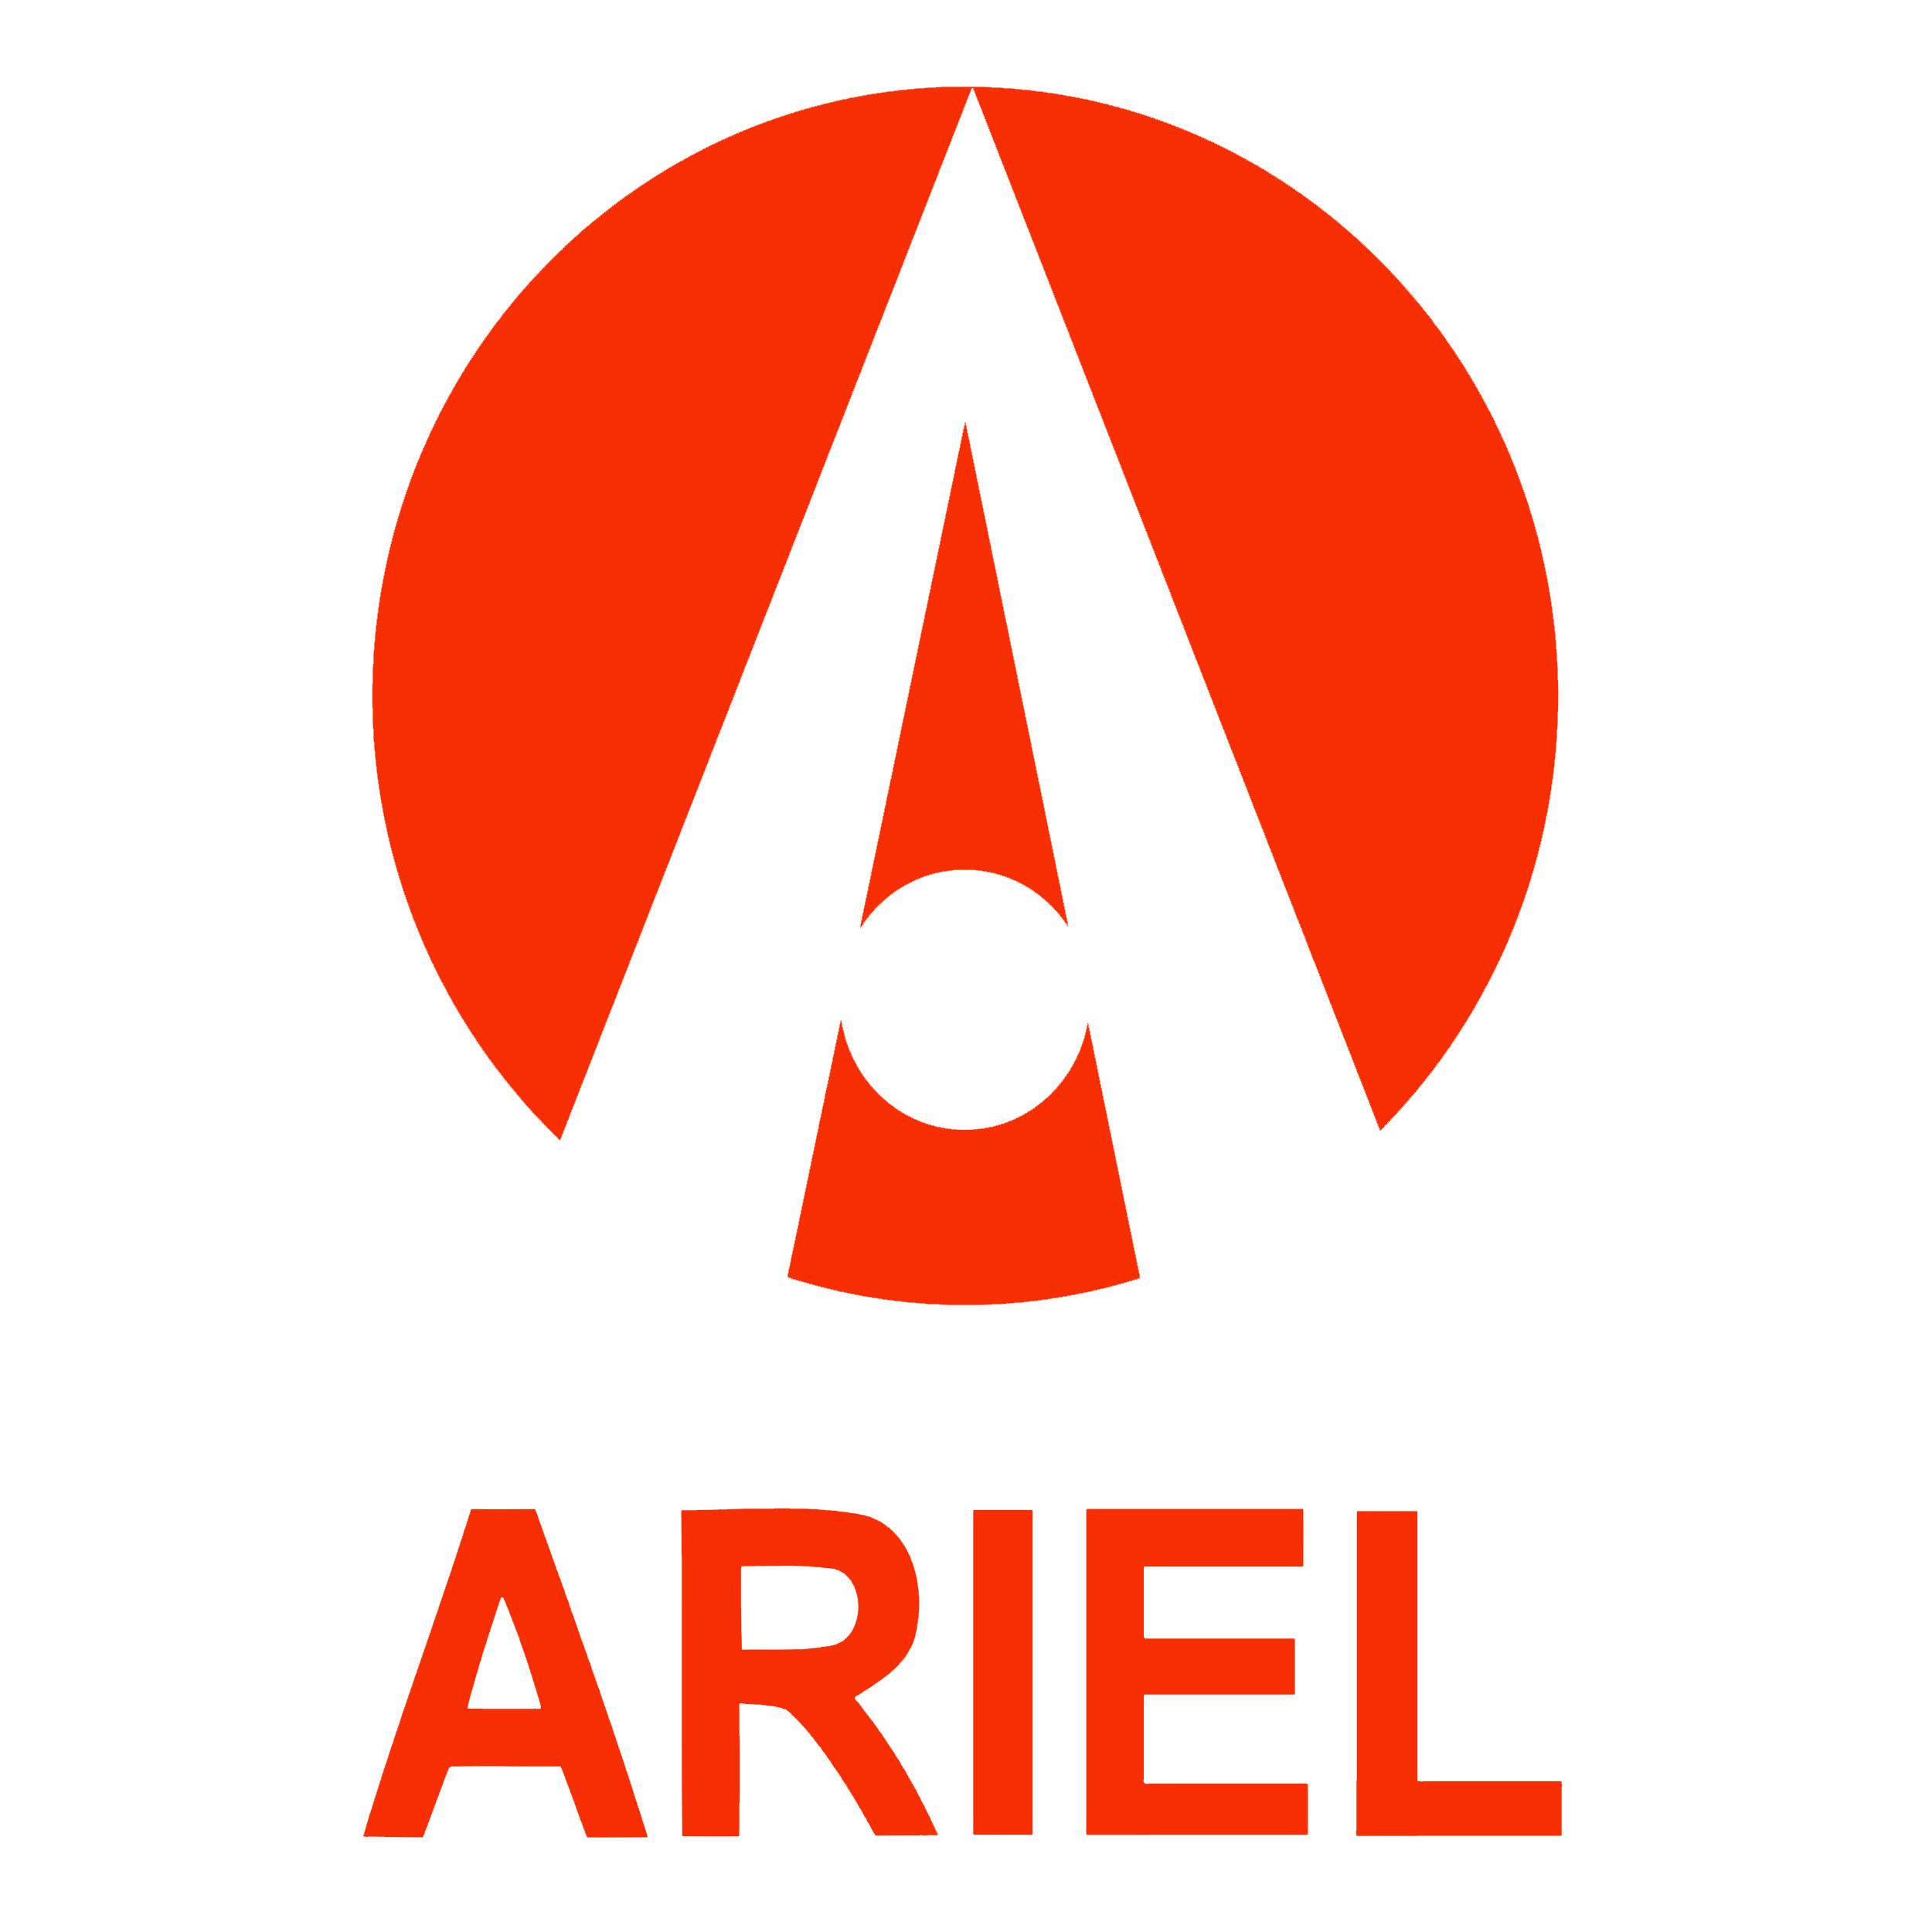 Imagen logo de Ariel